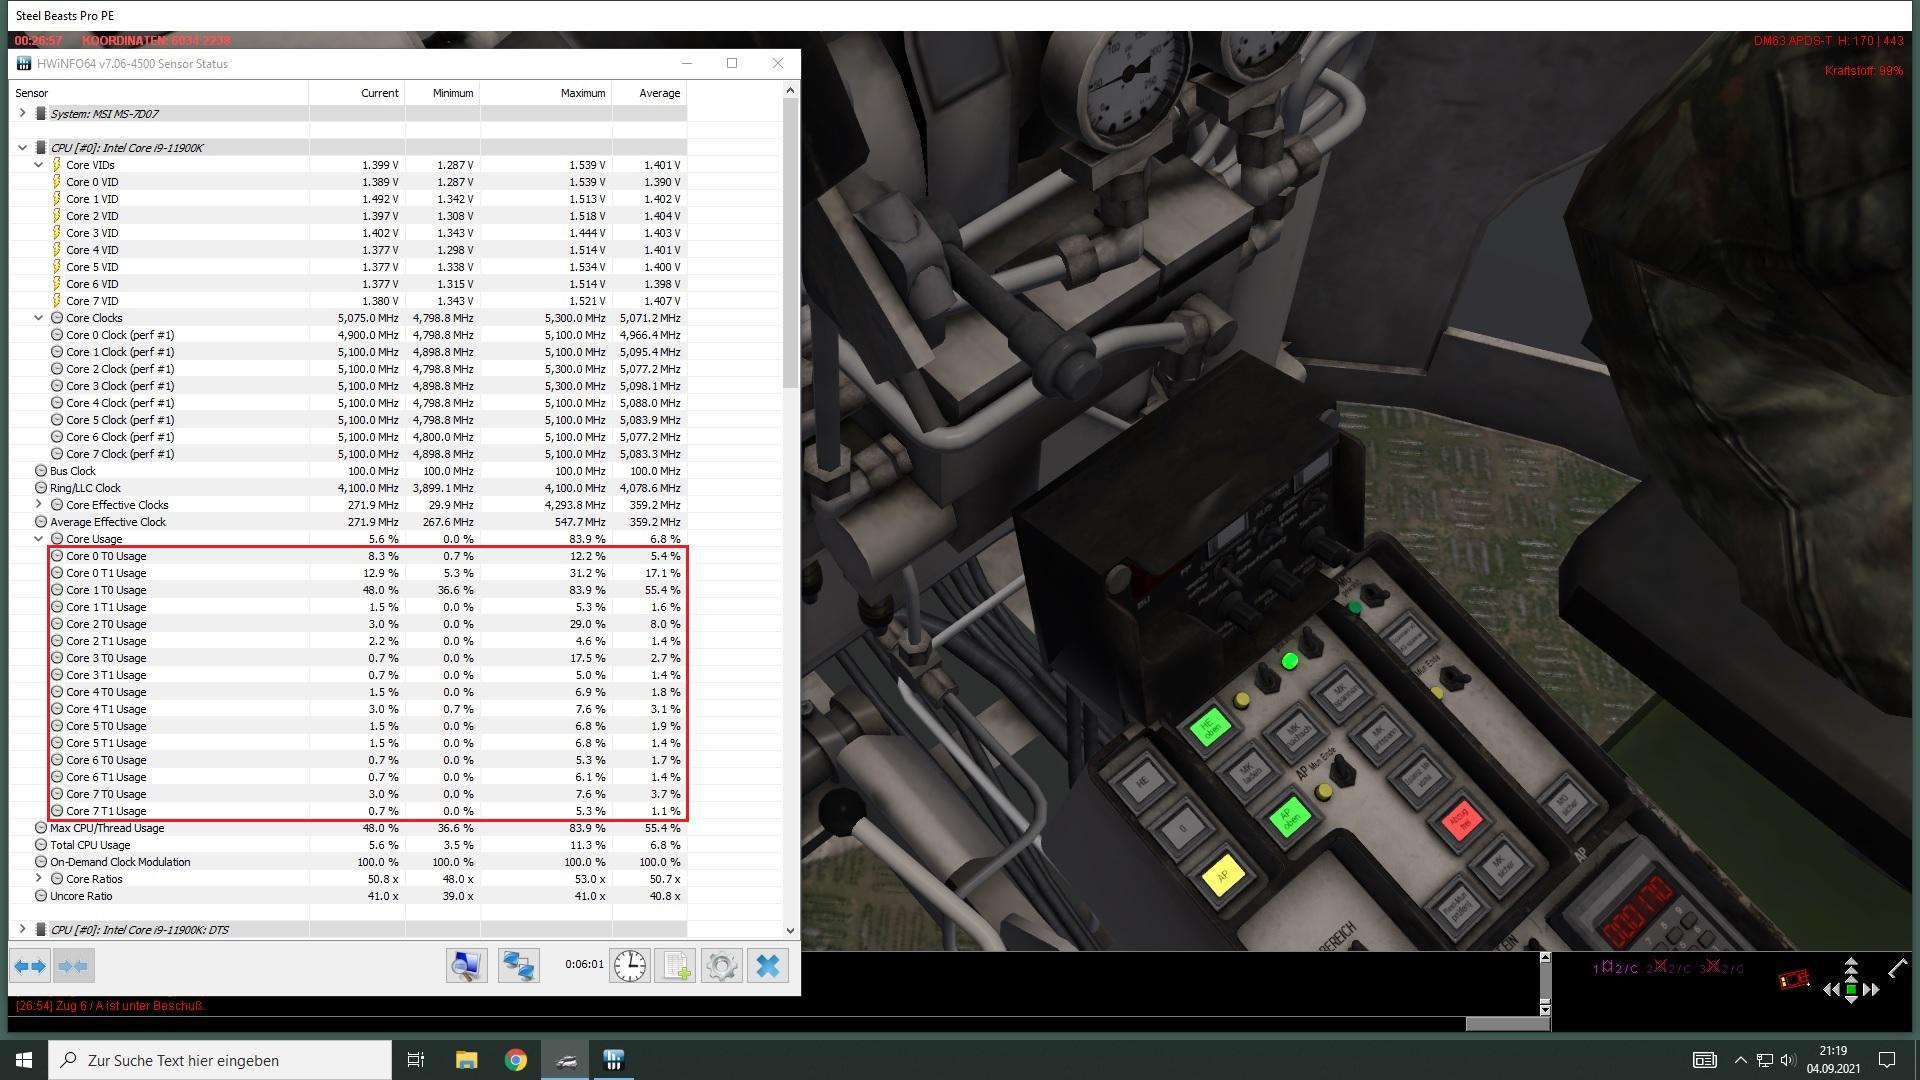 Vcore_Simulation_Usage.jpg